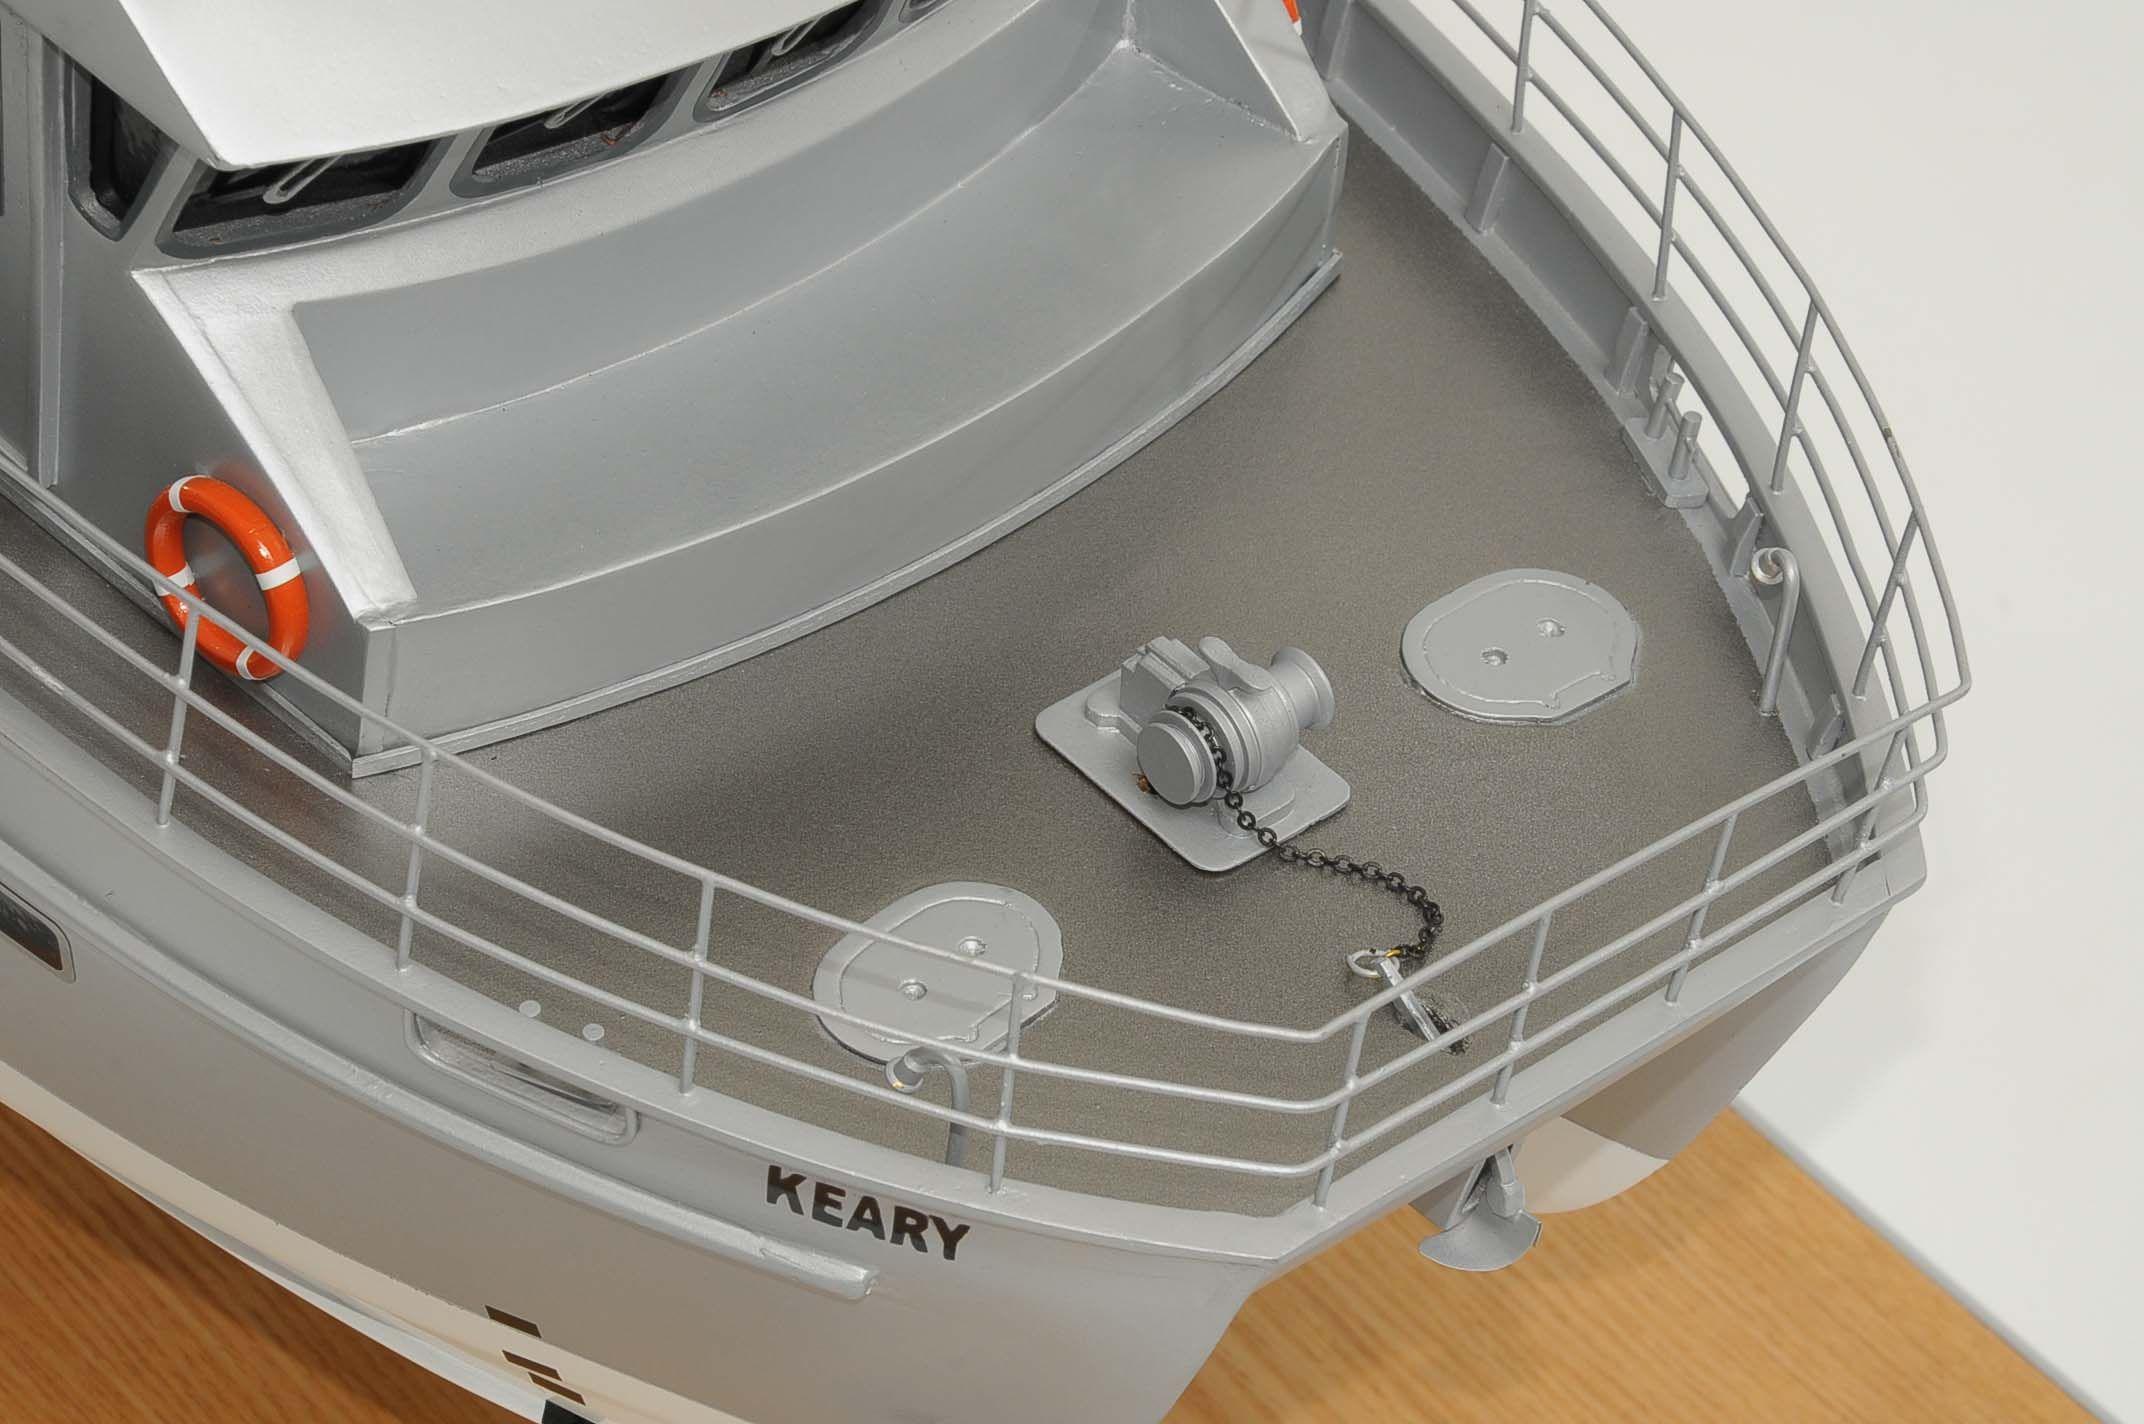 1064-5919-Rv-Keary